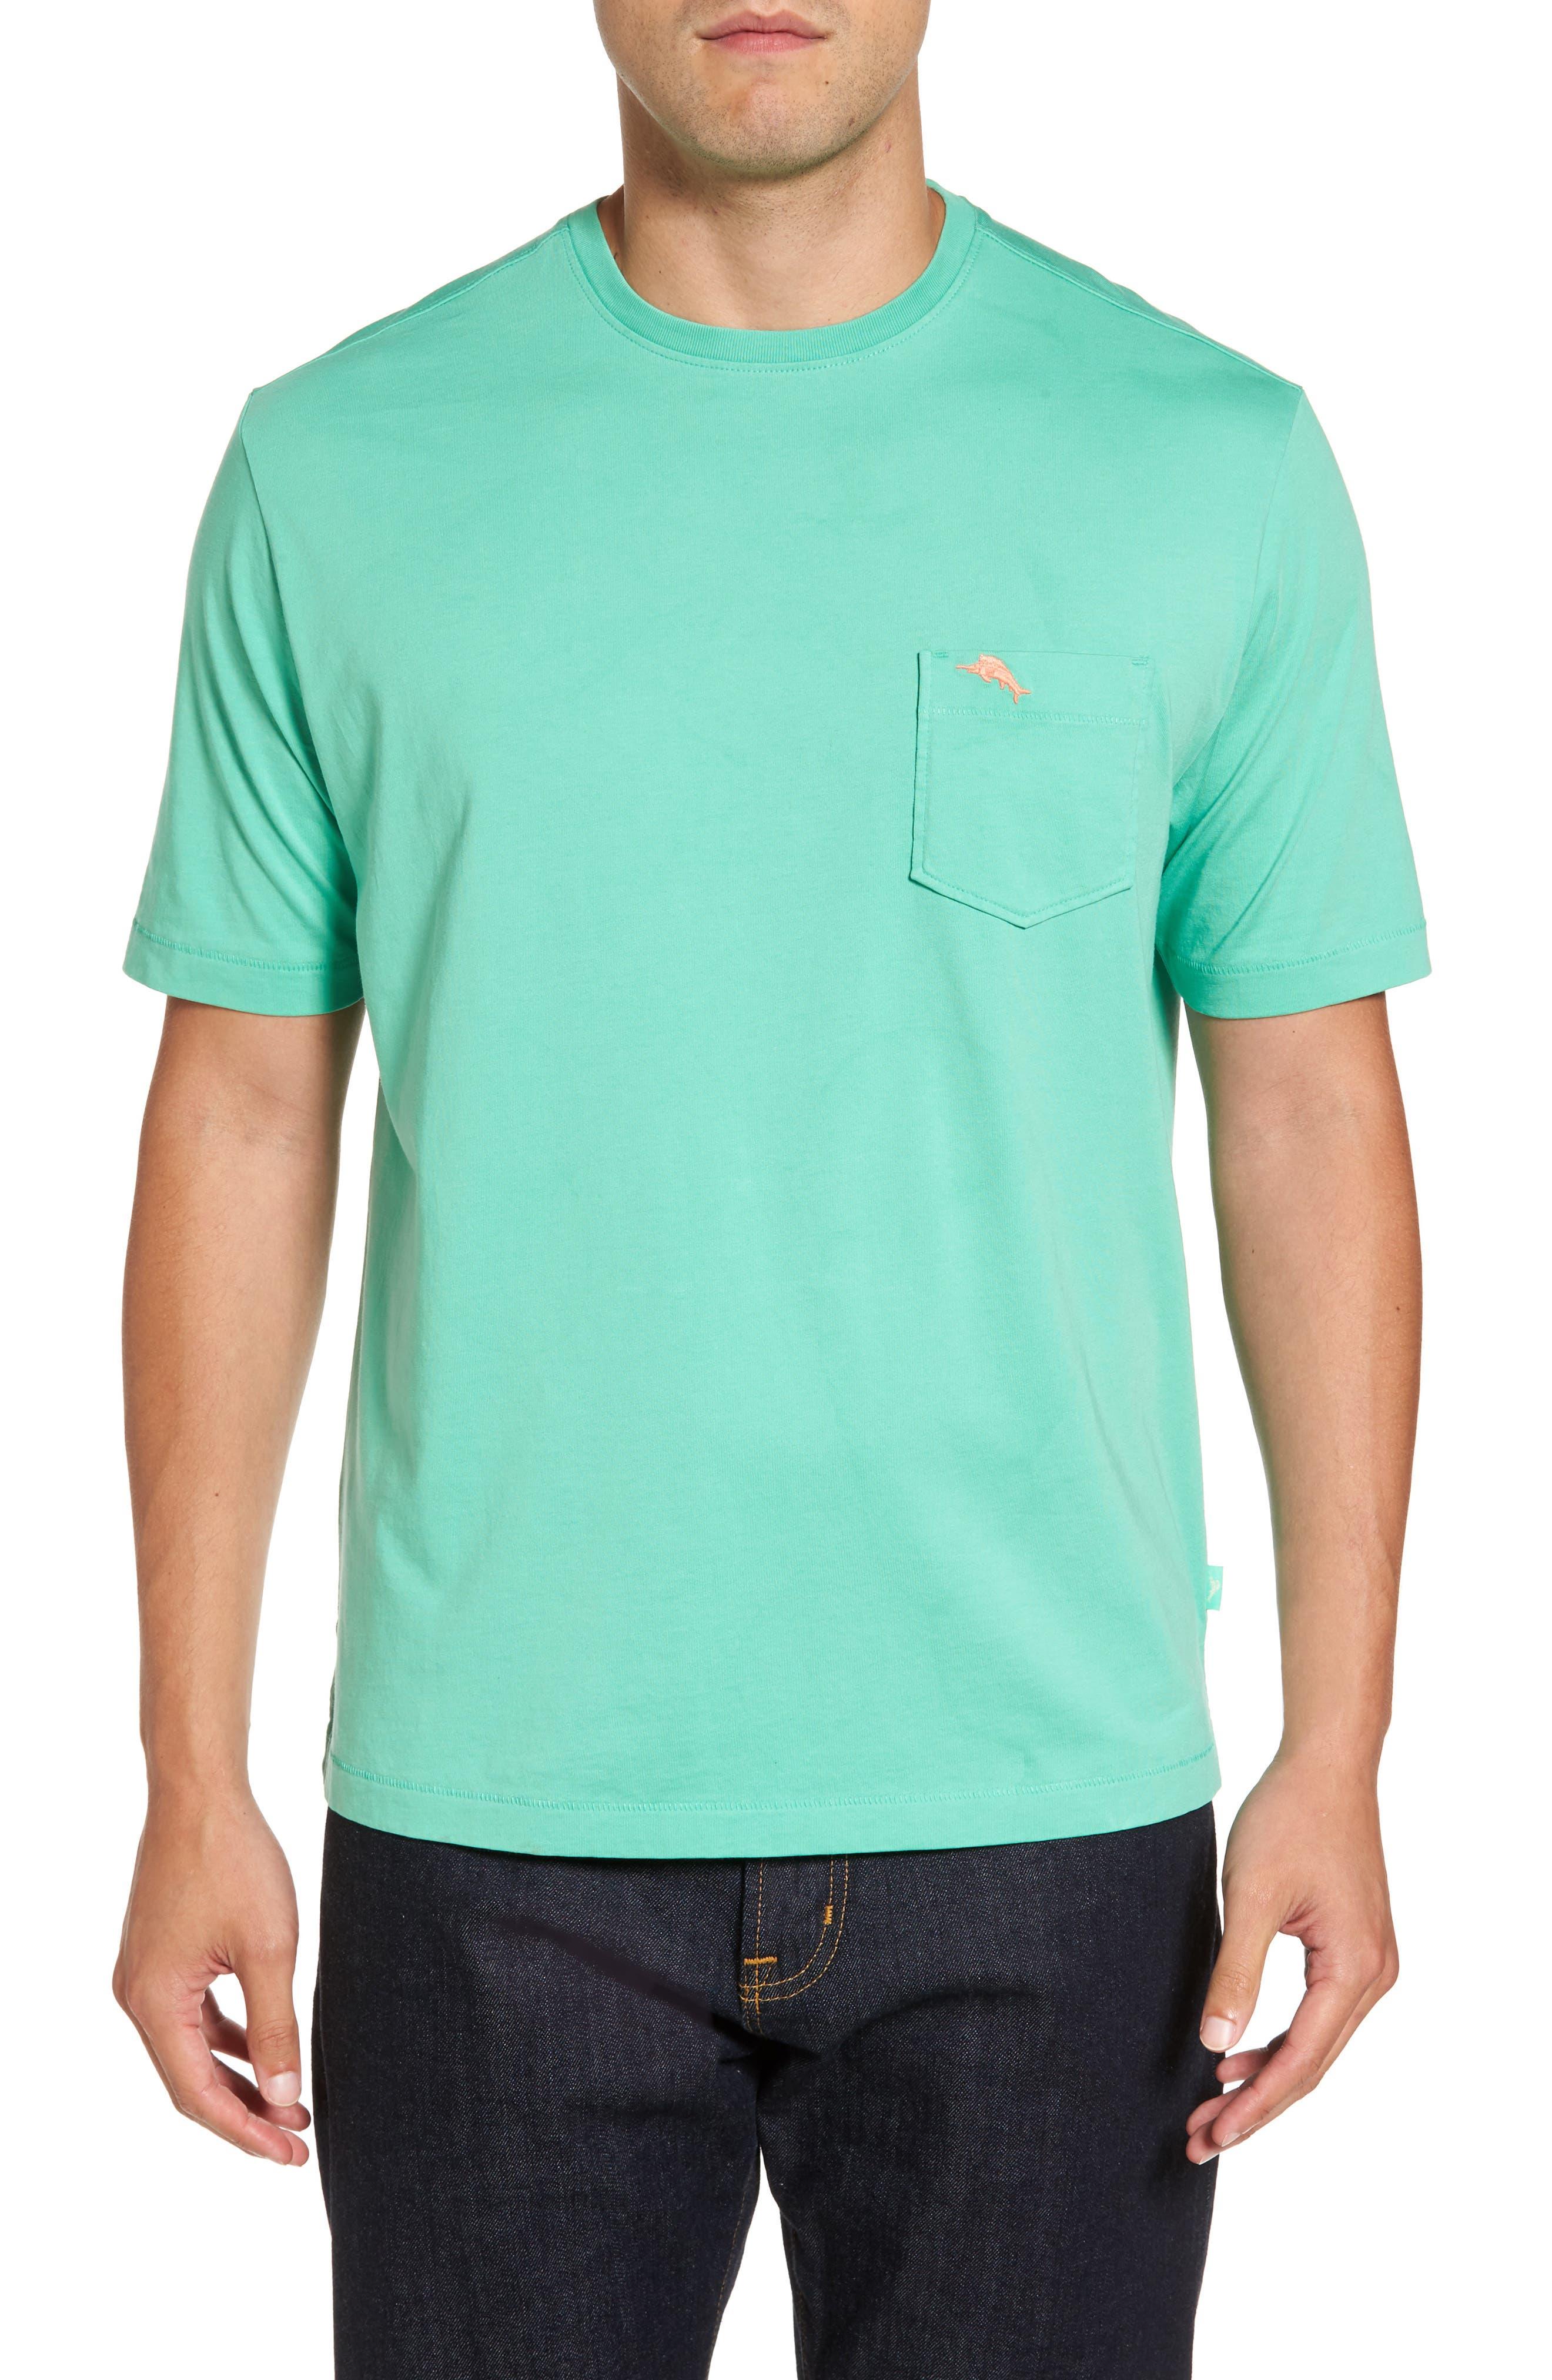 Bali Skyline Pocket T-Shirt,                         Main,                         color, 300